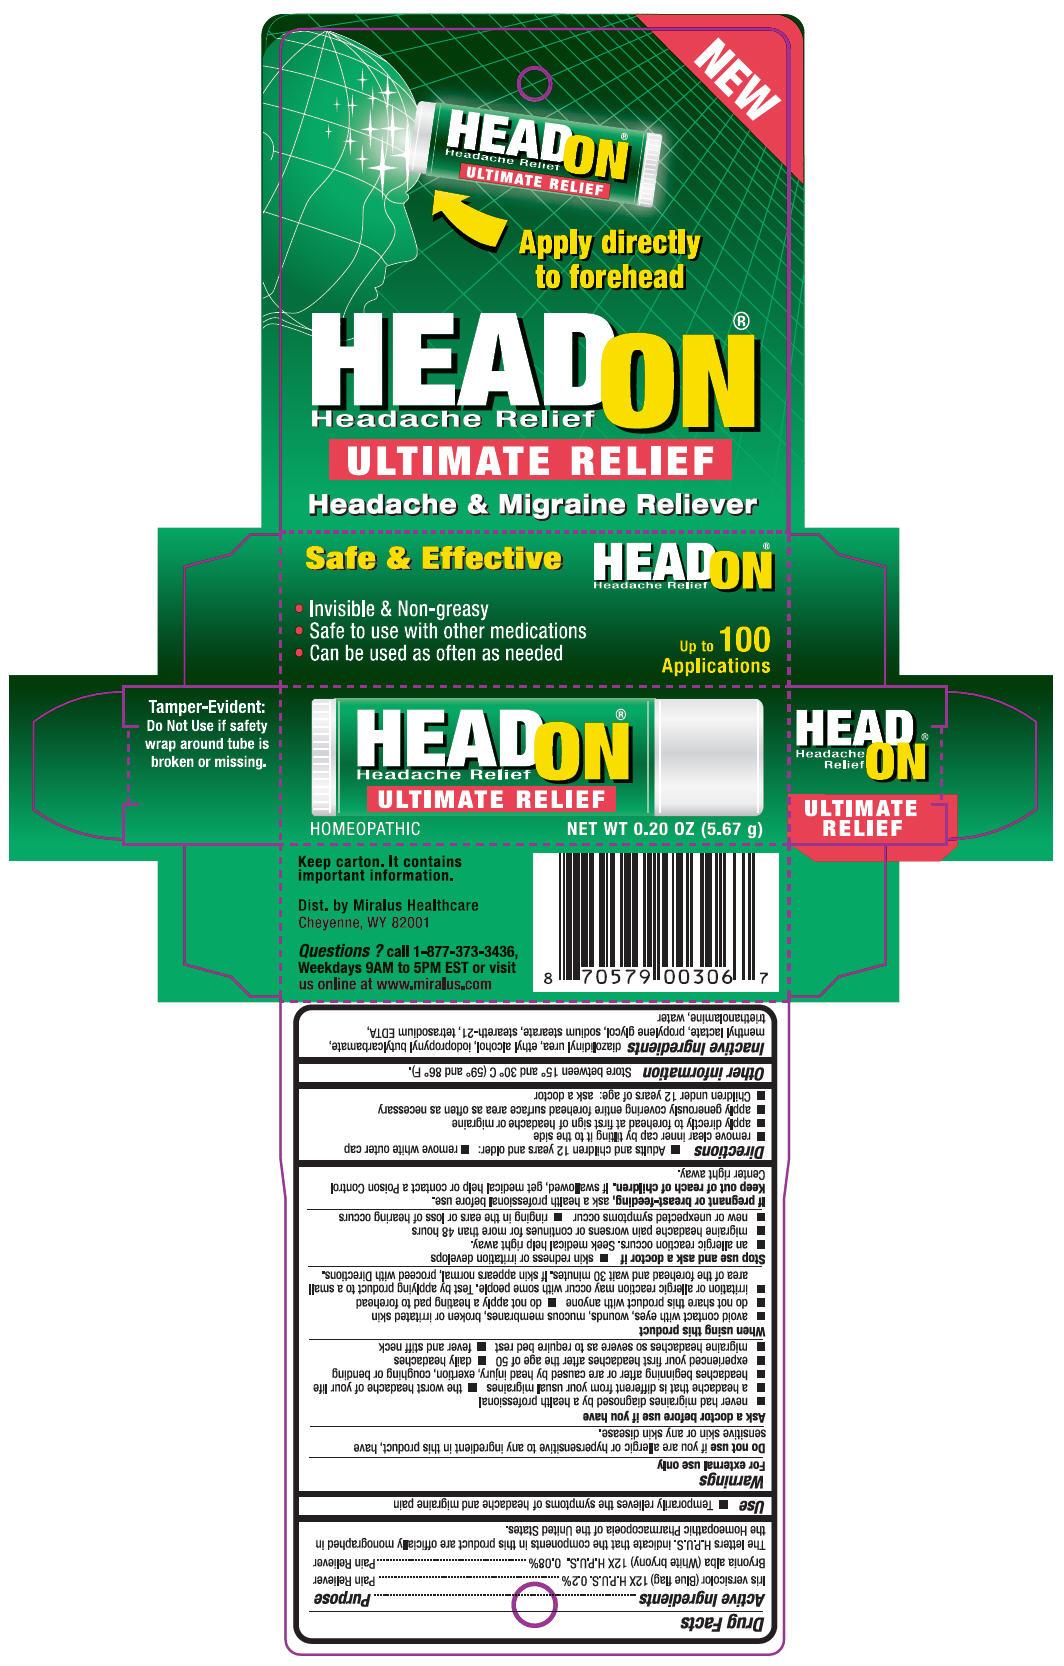 PRINCIPAL DISPLAY PANEL - 5.67 gram canister carton